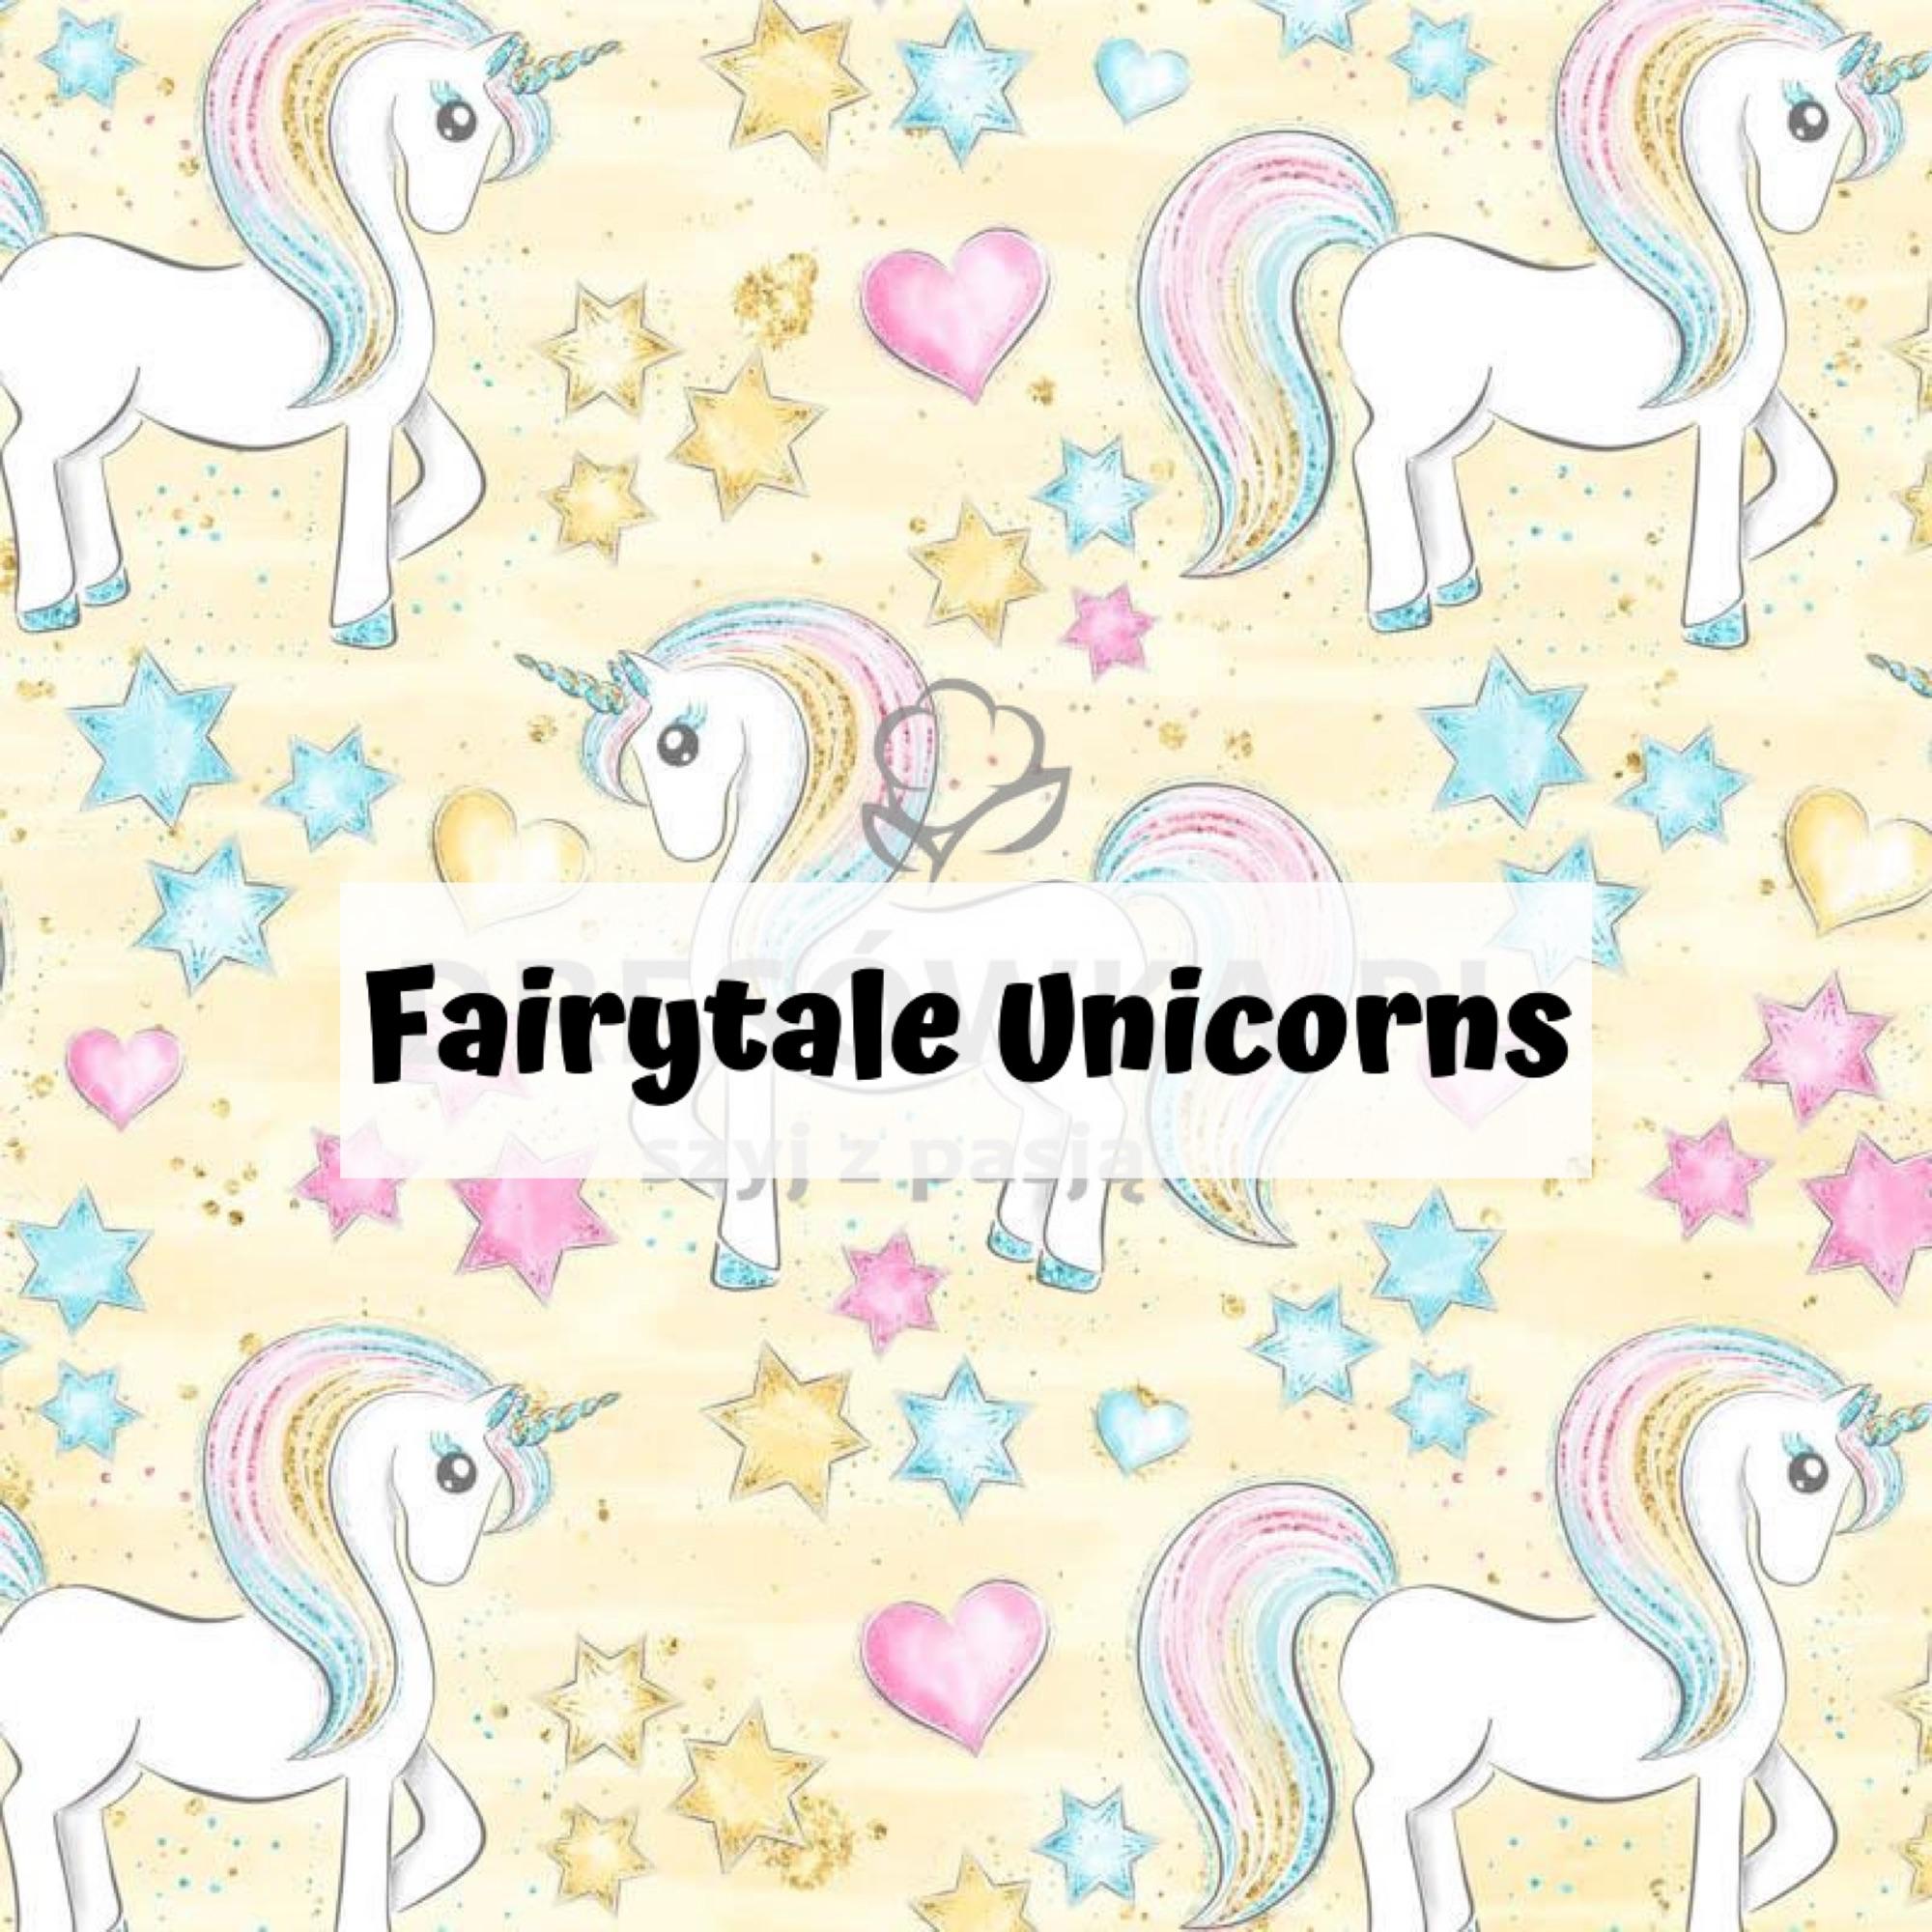 Fairytale Unicorns